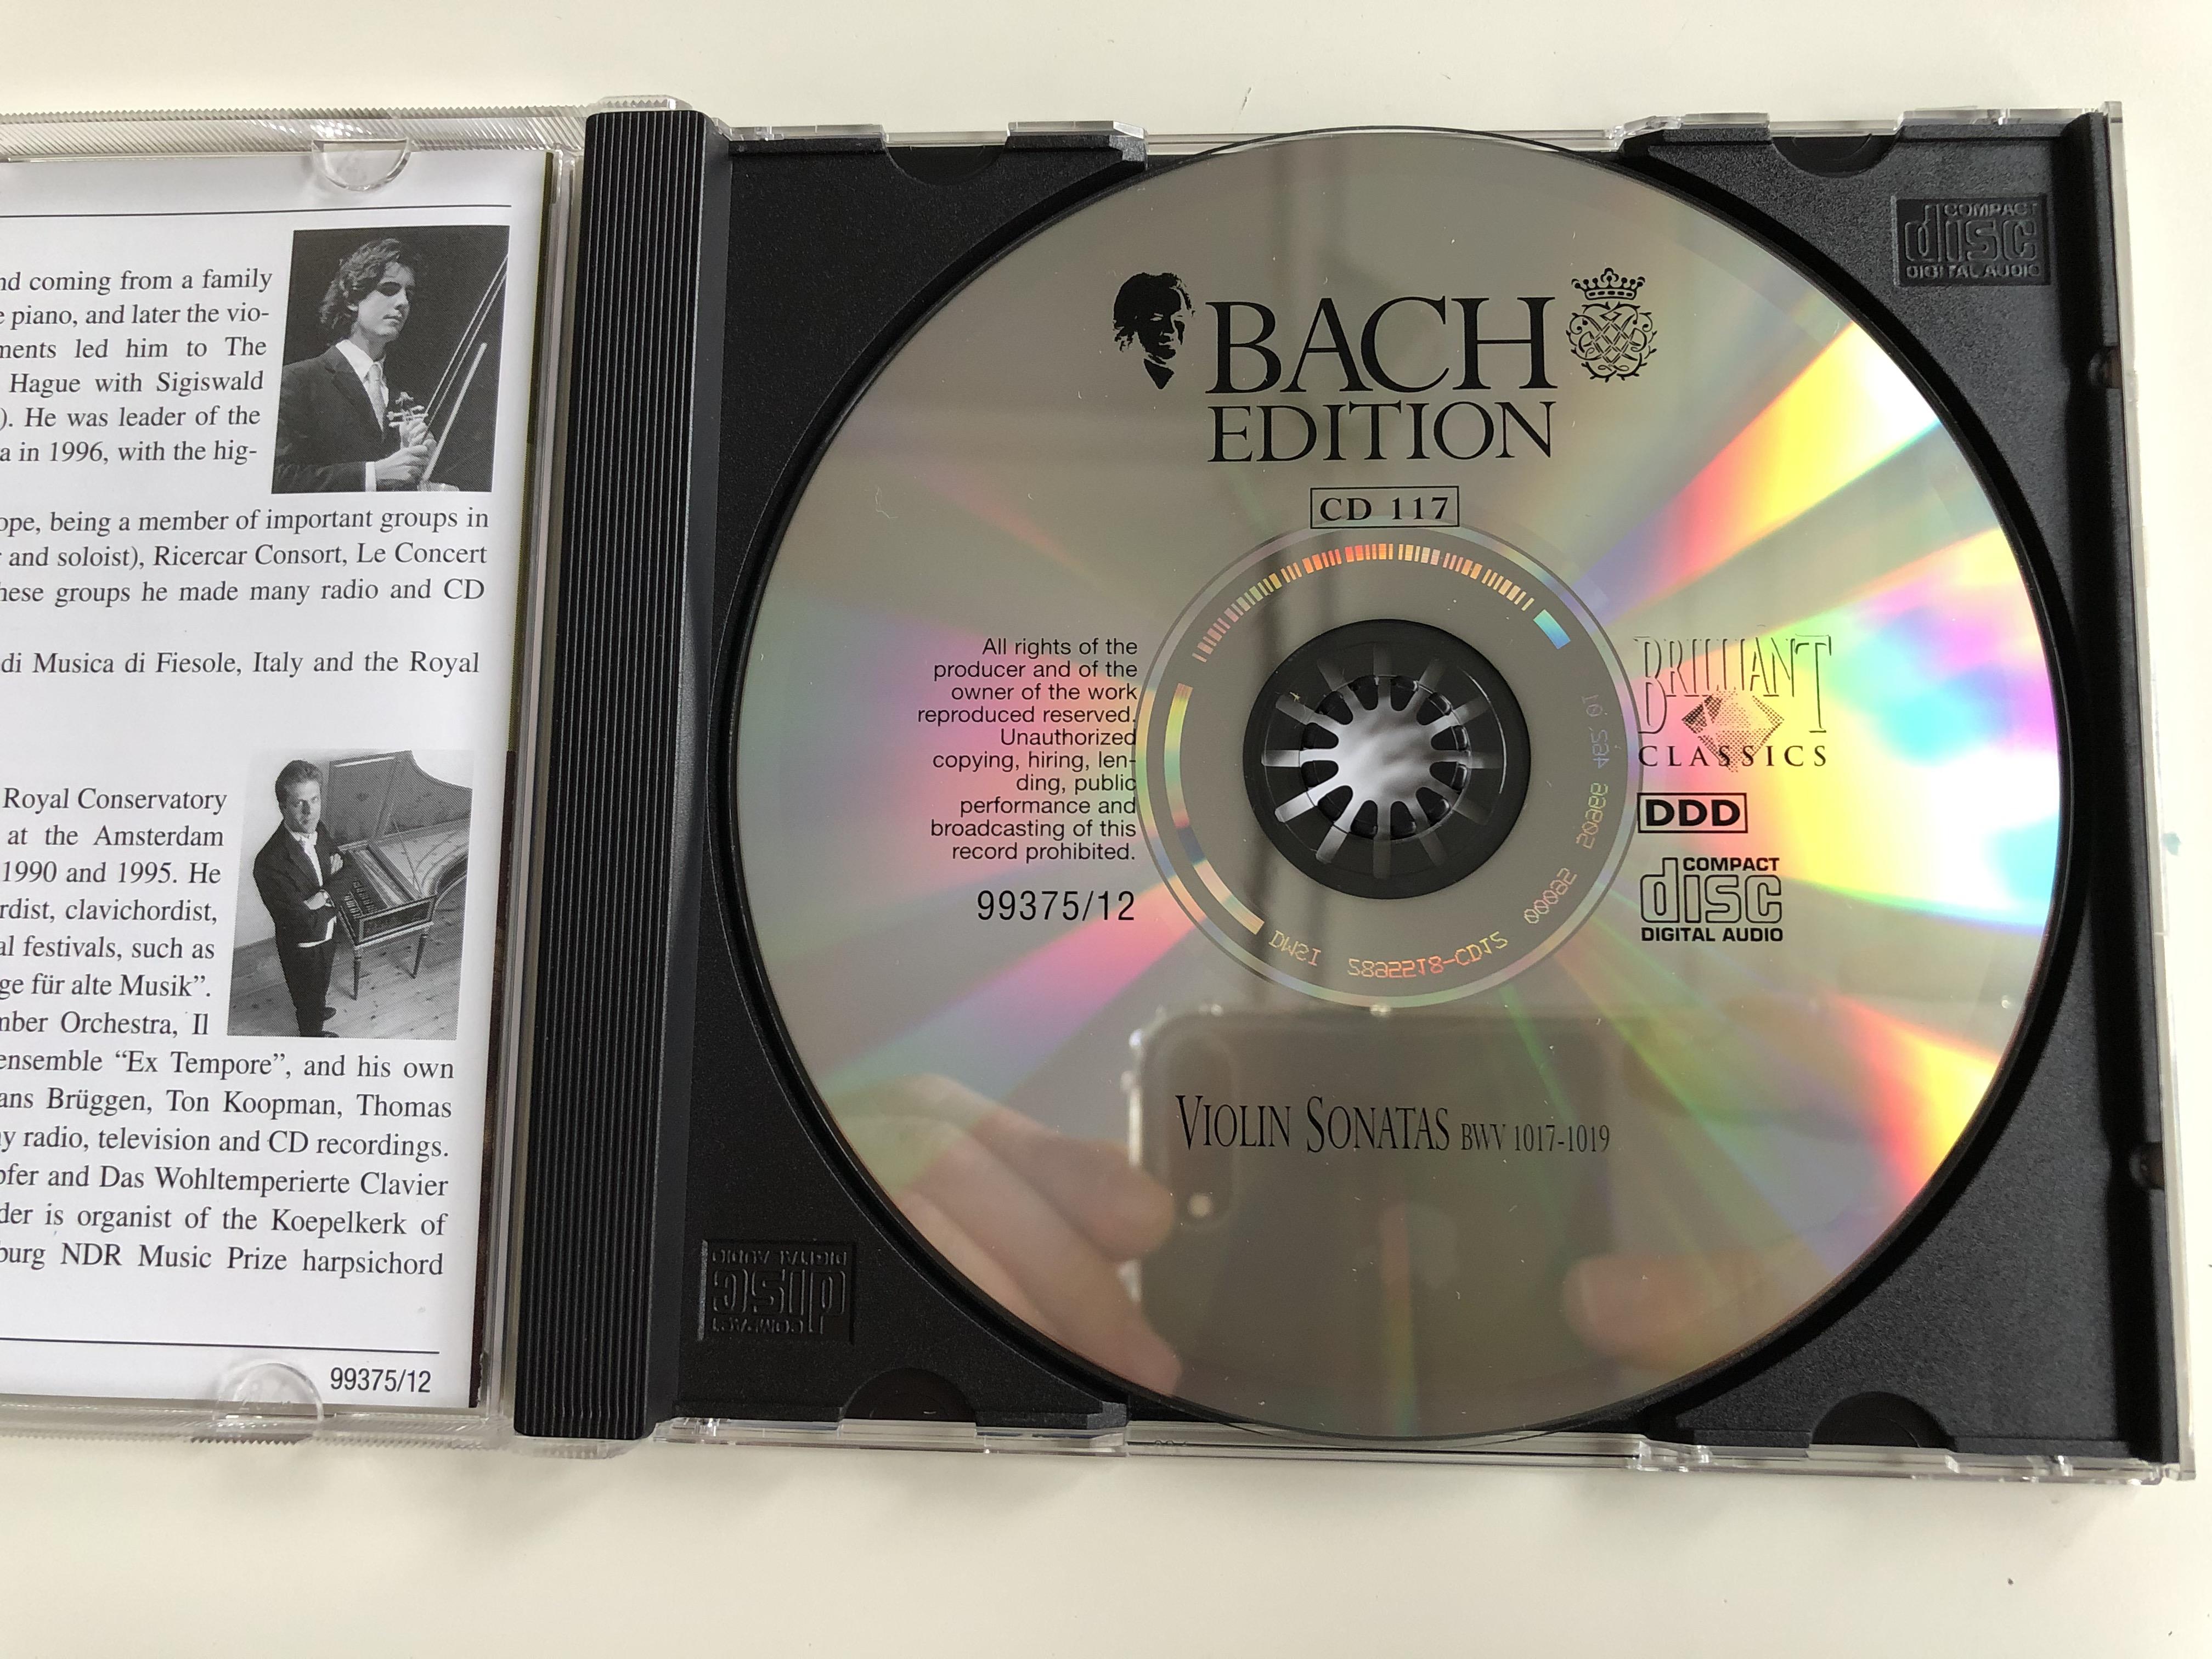 bach-edition-violin-sonatas-bwv-1017-1019-violinsonaten-brilliant-classics-audio-cd-9937512-3-.jpg